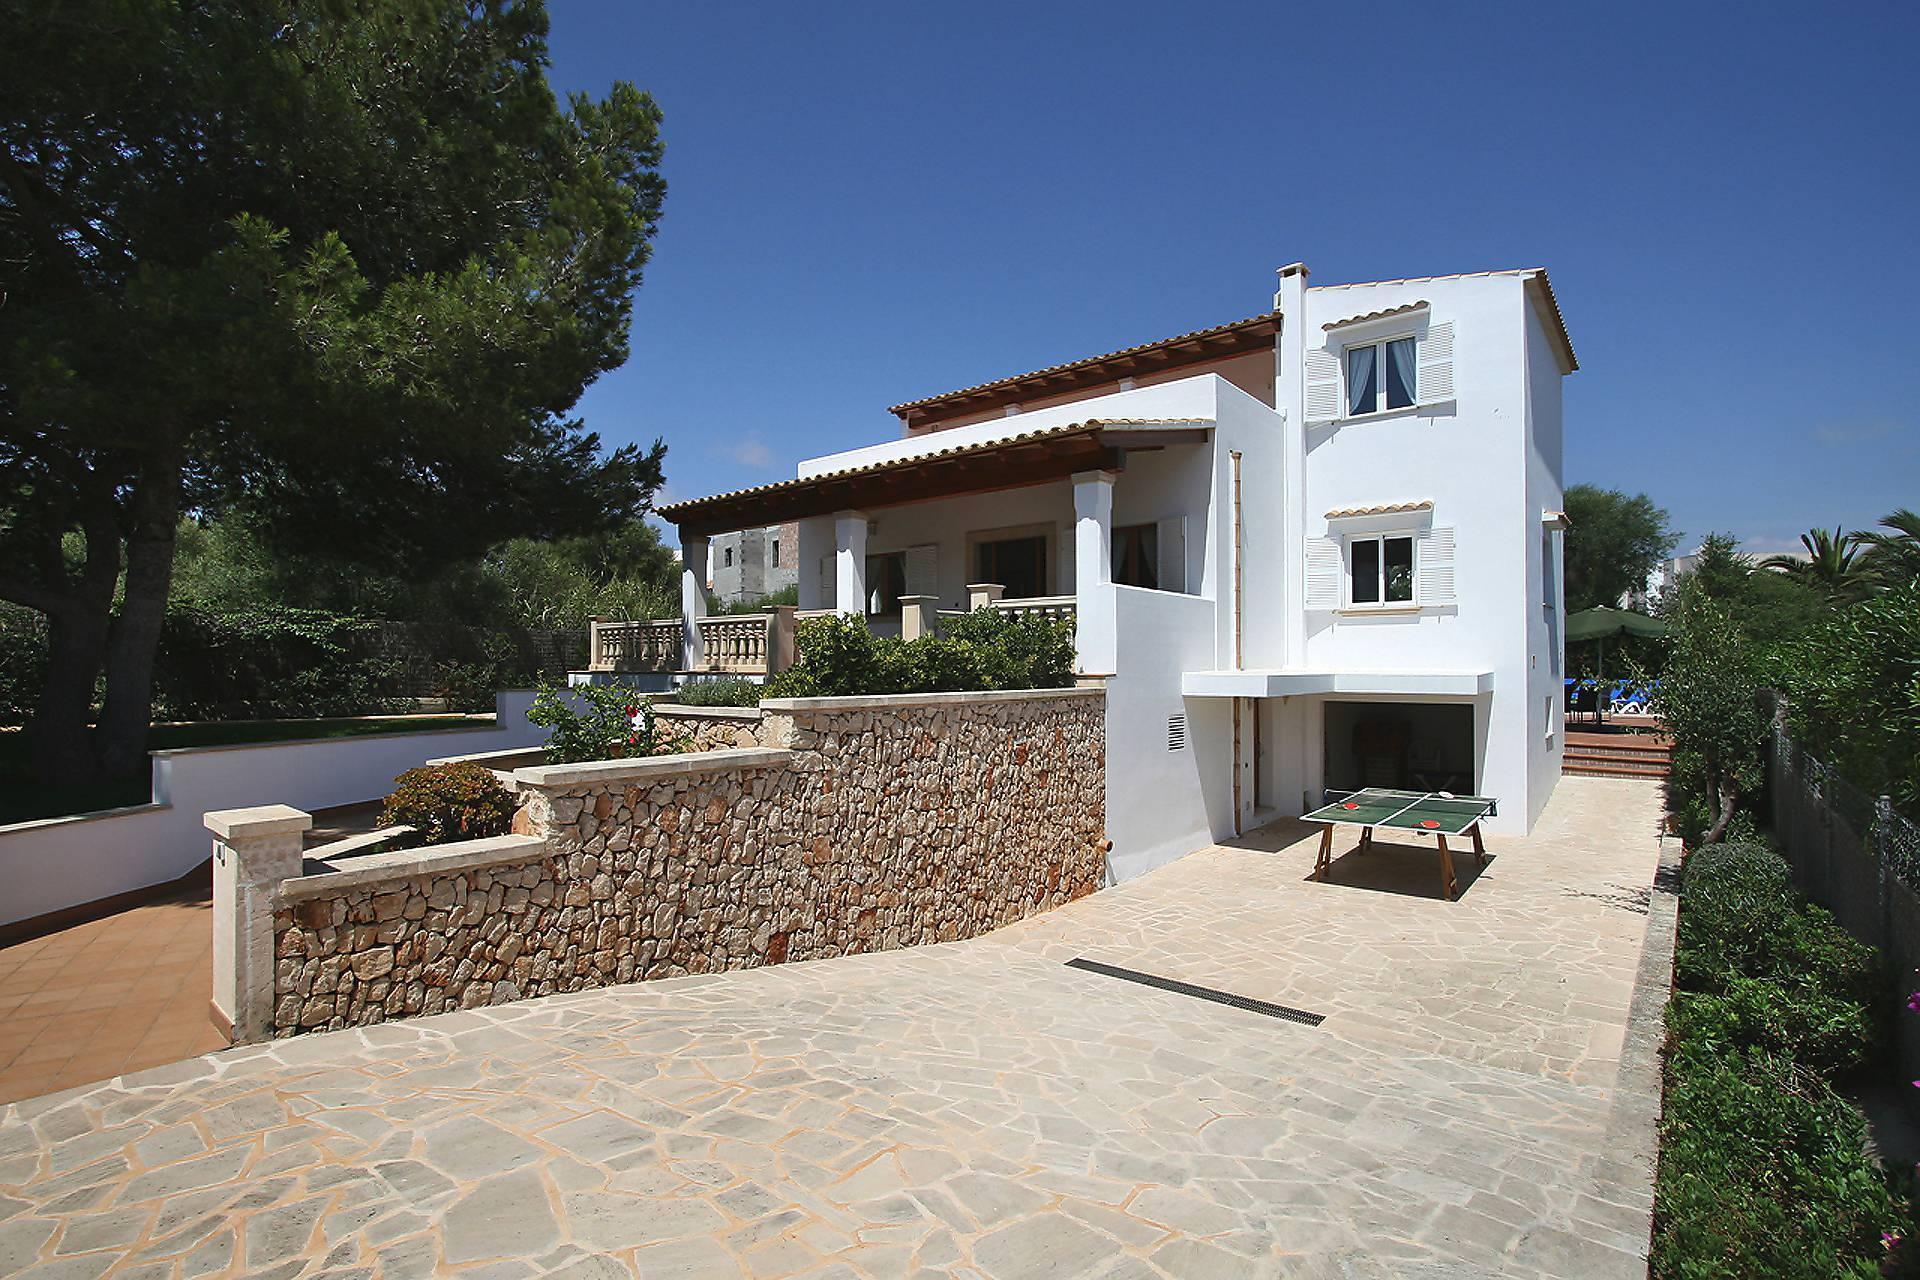 01-128 Rustic holiday home Majorca East Bild 2